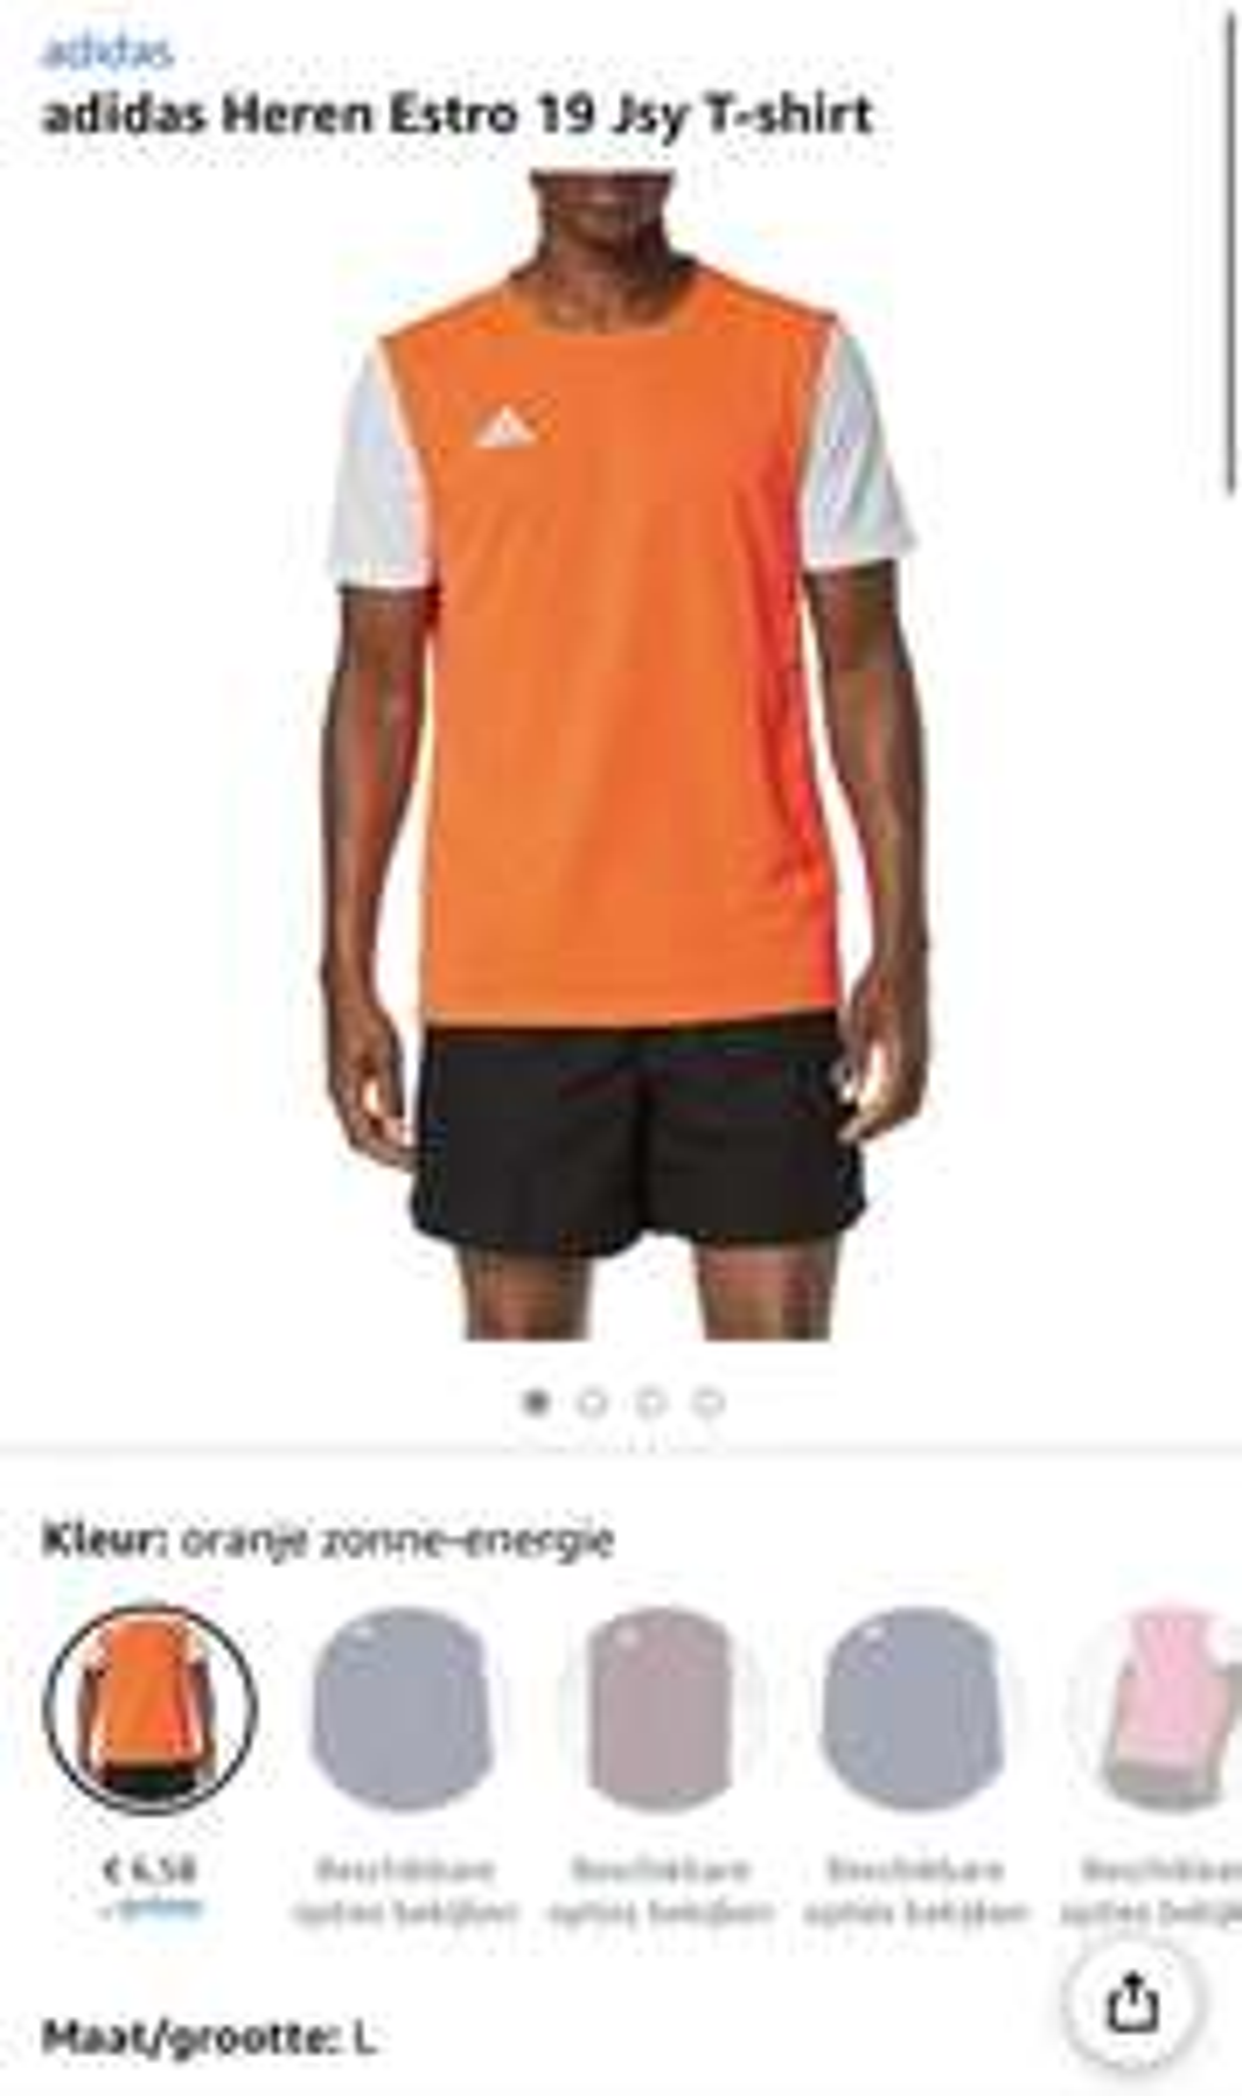 adidas Heren Estro T-shirt vanaf €6,58